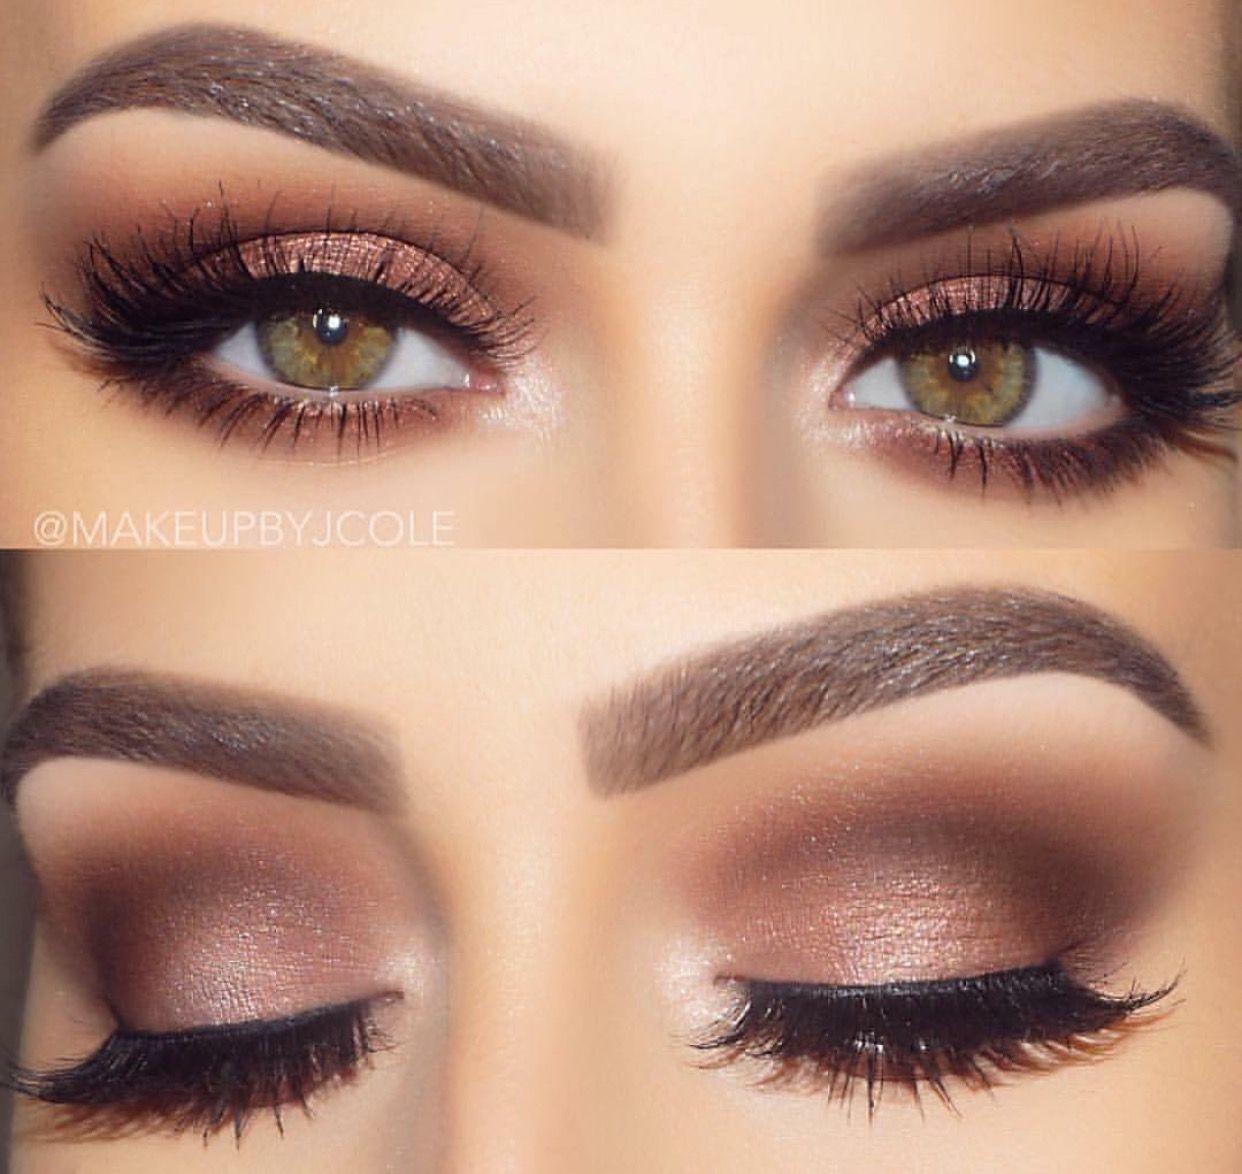 pinterest// @dariannskye | makeup for hazel eyes, no